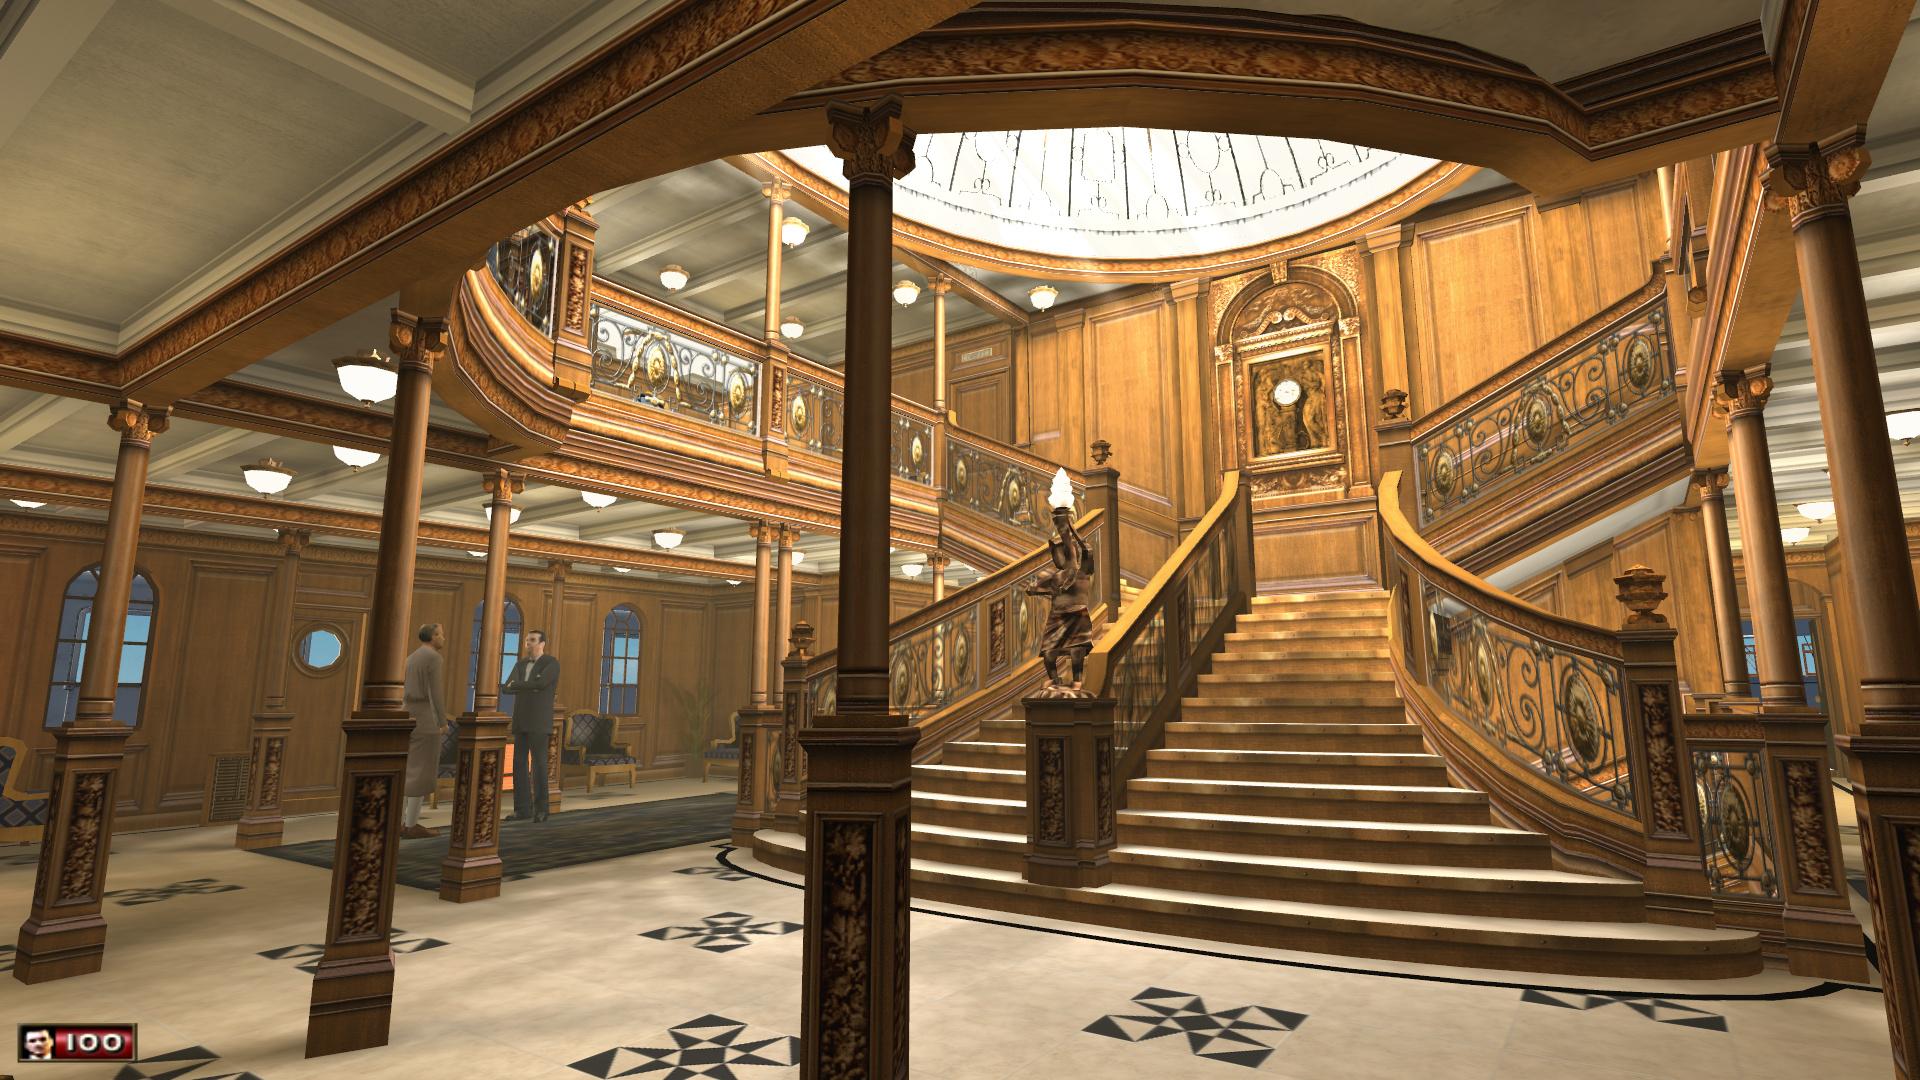 d8fdbdfa0f93a735 1920xH - Энтузиасты почти 15 лет строят «Титаник» в Mafia: The City of Lost Heaven